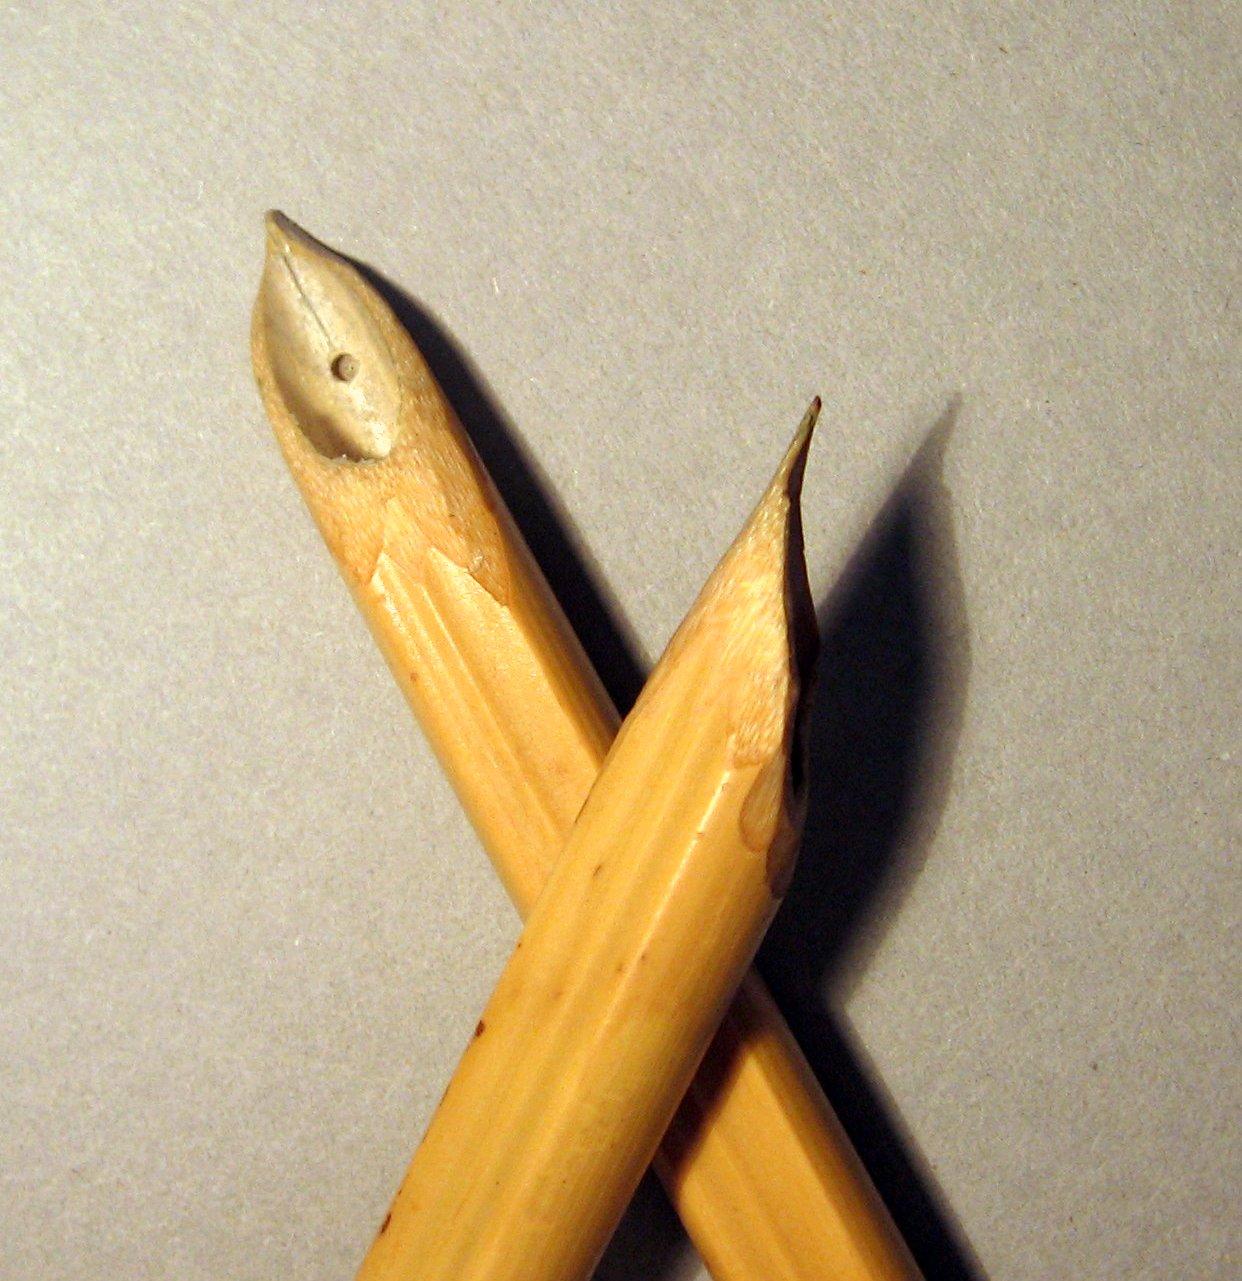 Acquerelliamo insieme: fai da te: costruire una penna di bambù